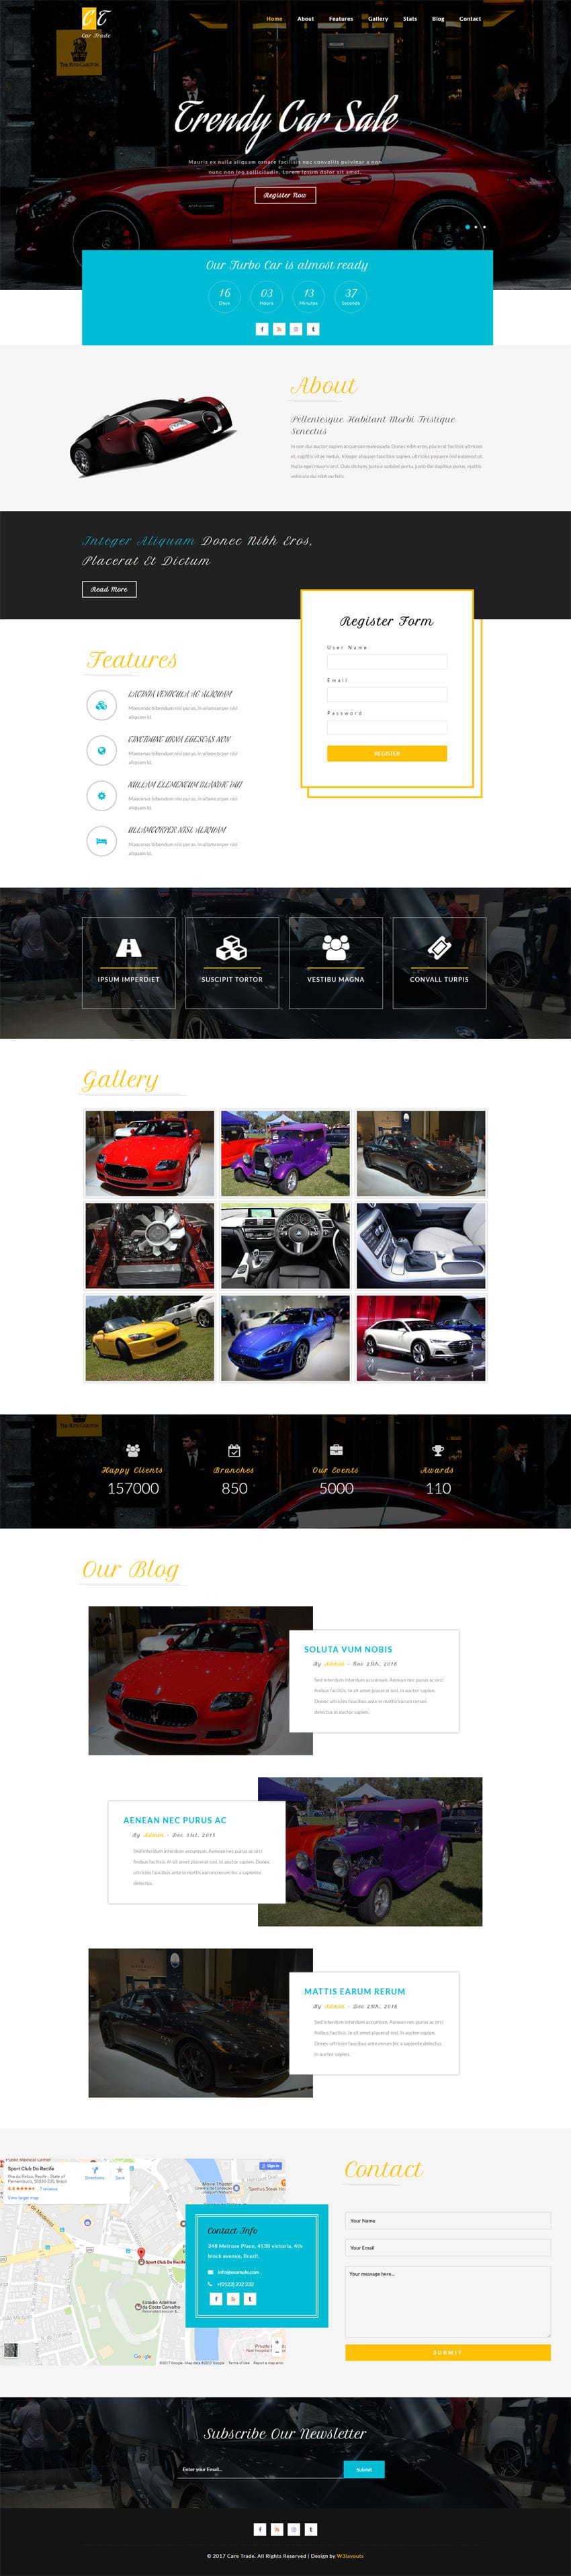 Car Trade An Autos Transportation Bootstrap Responsive Web Template